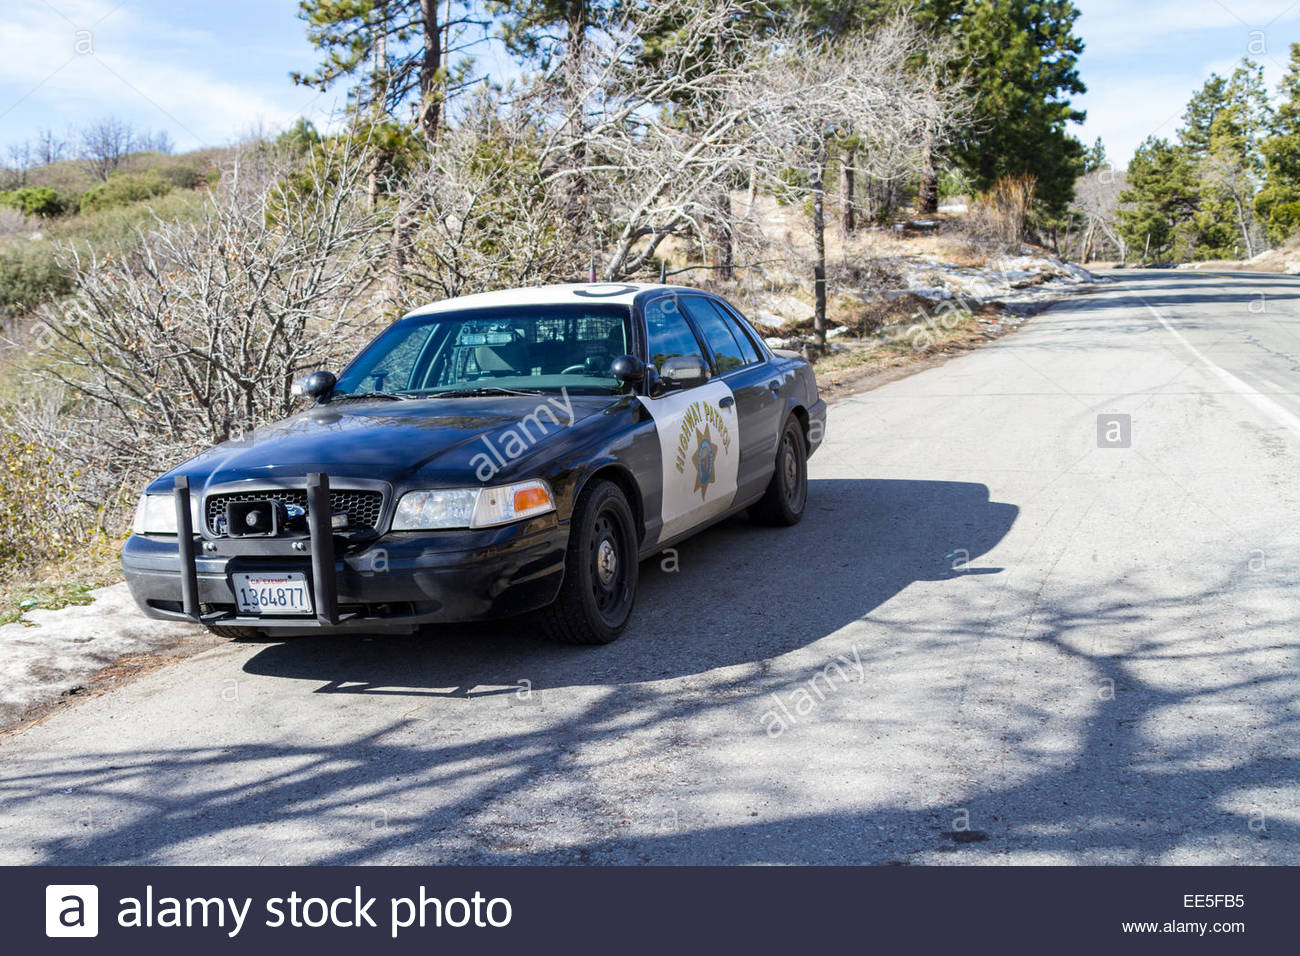 california highway patrol chp car on road usa california